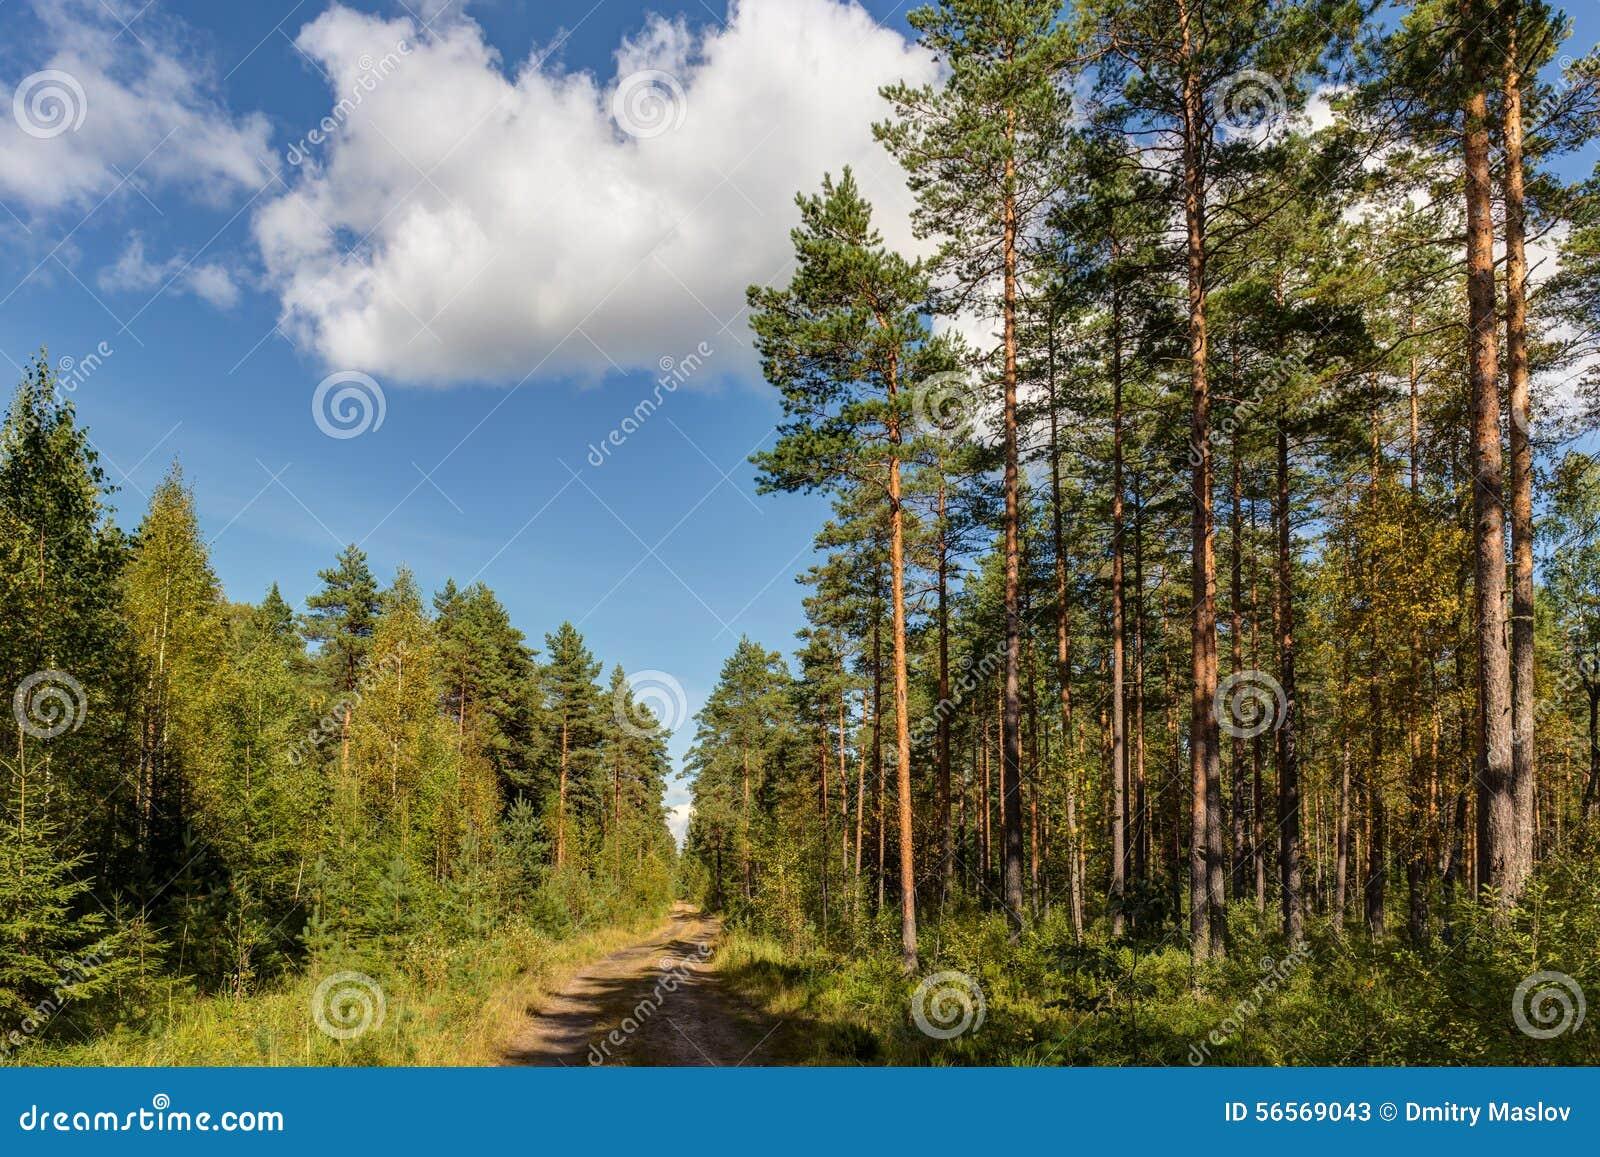 Download Δρόμος σε ένα ηλιόλουστο δάσος Στοκ Εικόνα - εικόνα από υπαίθρια, φύλλωμα: 56569043